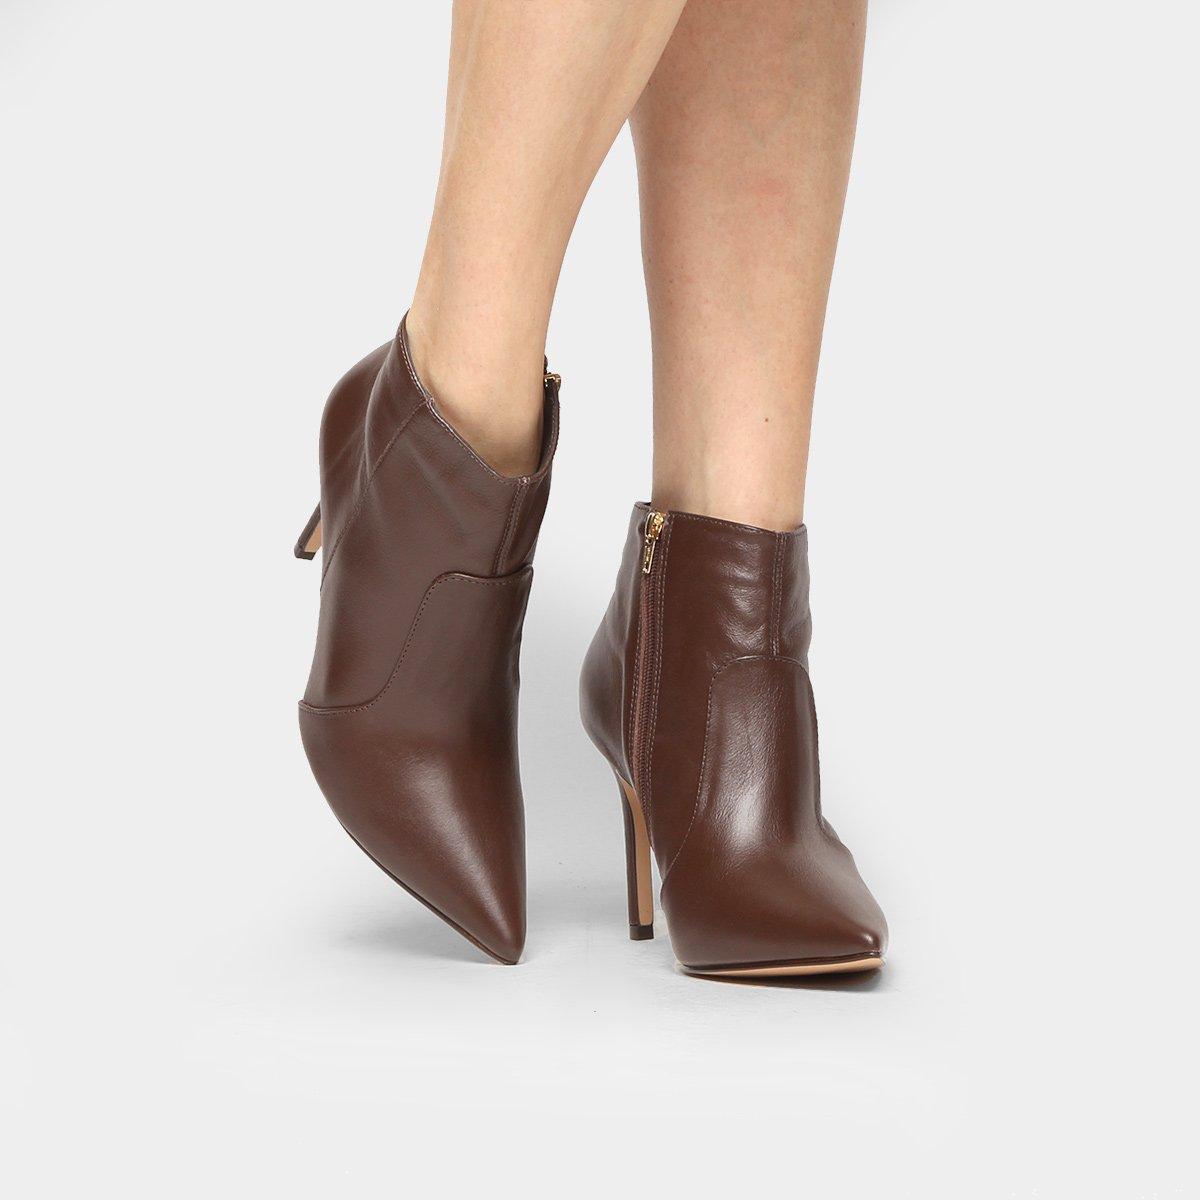 d01bf3b843 Bota Couro Shoestock Curta Salto Fino Feminina - Compre Agora ...